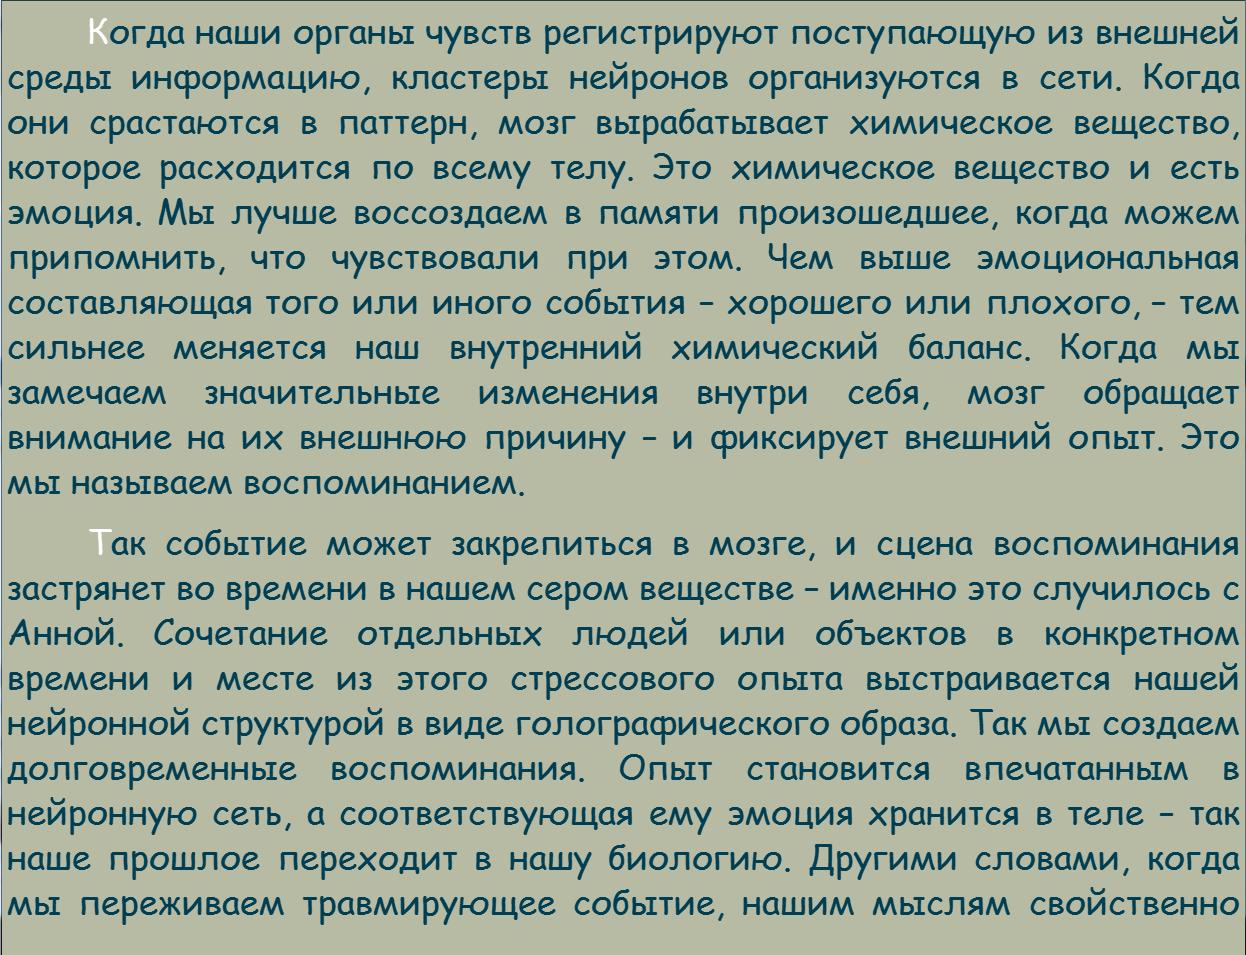 http://s3.uploads.ru/1K6Uv.png